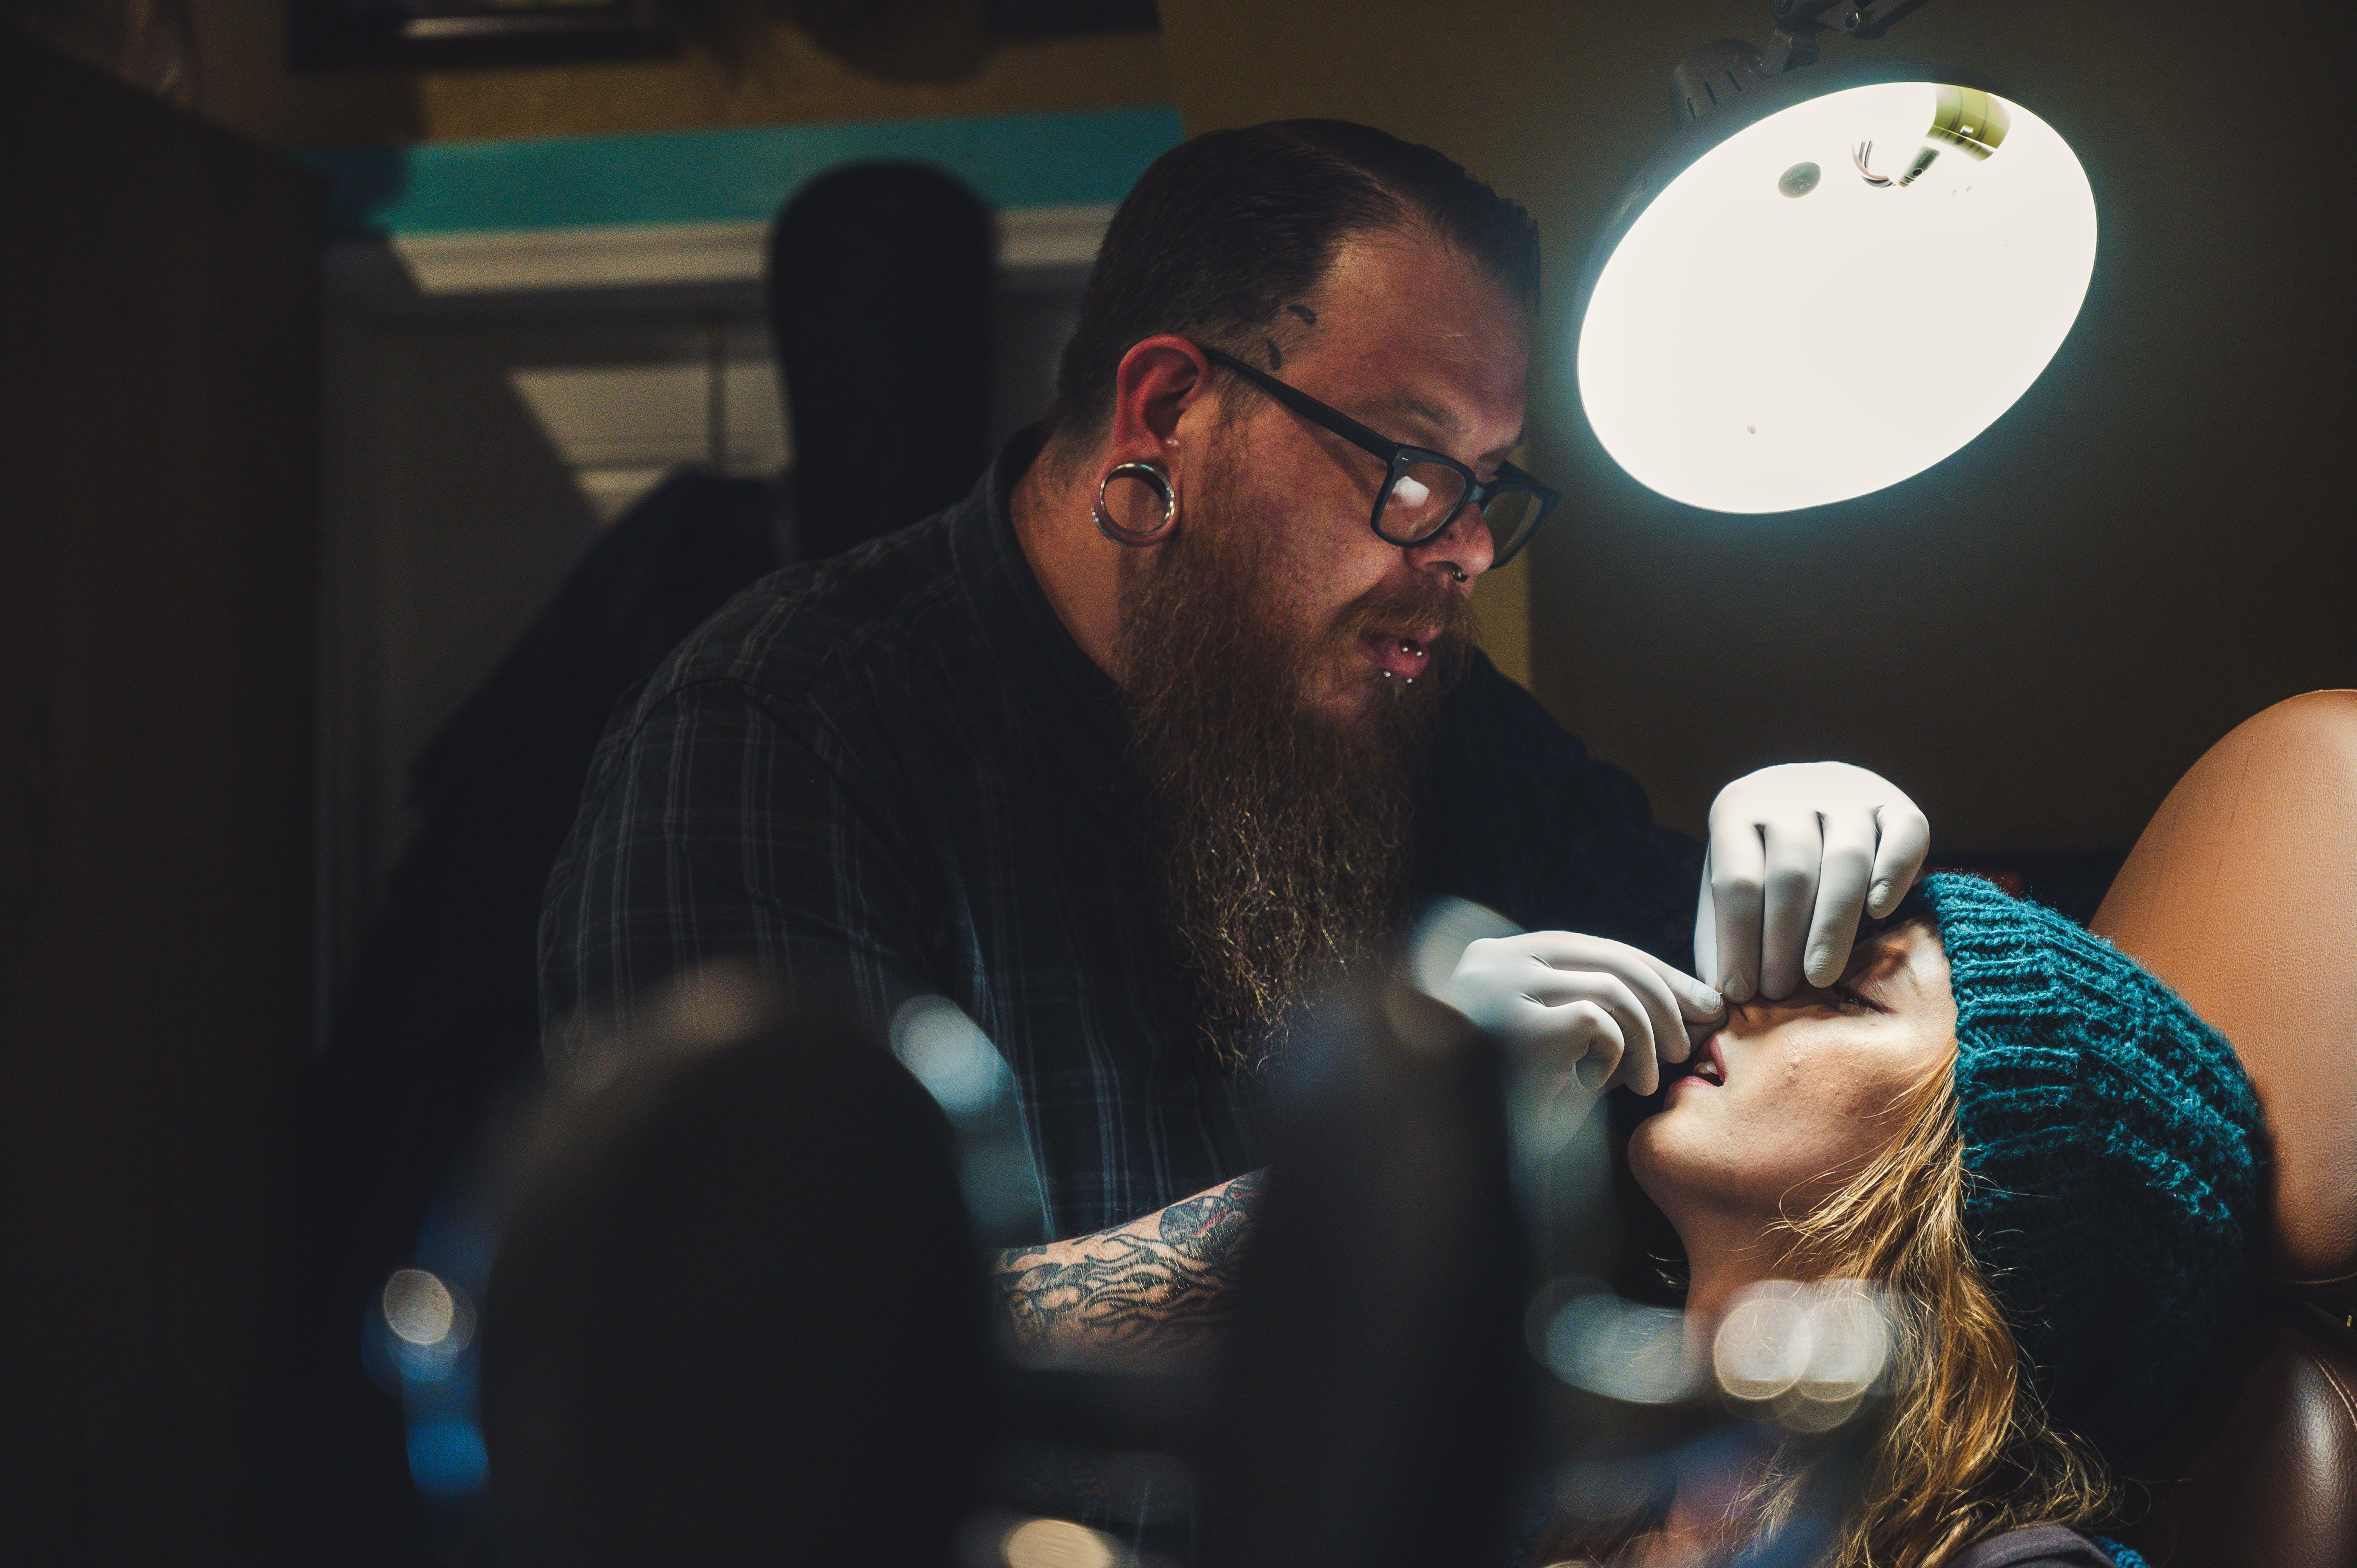 Man Piercing Woman